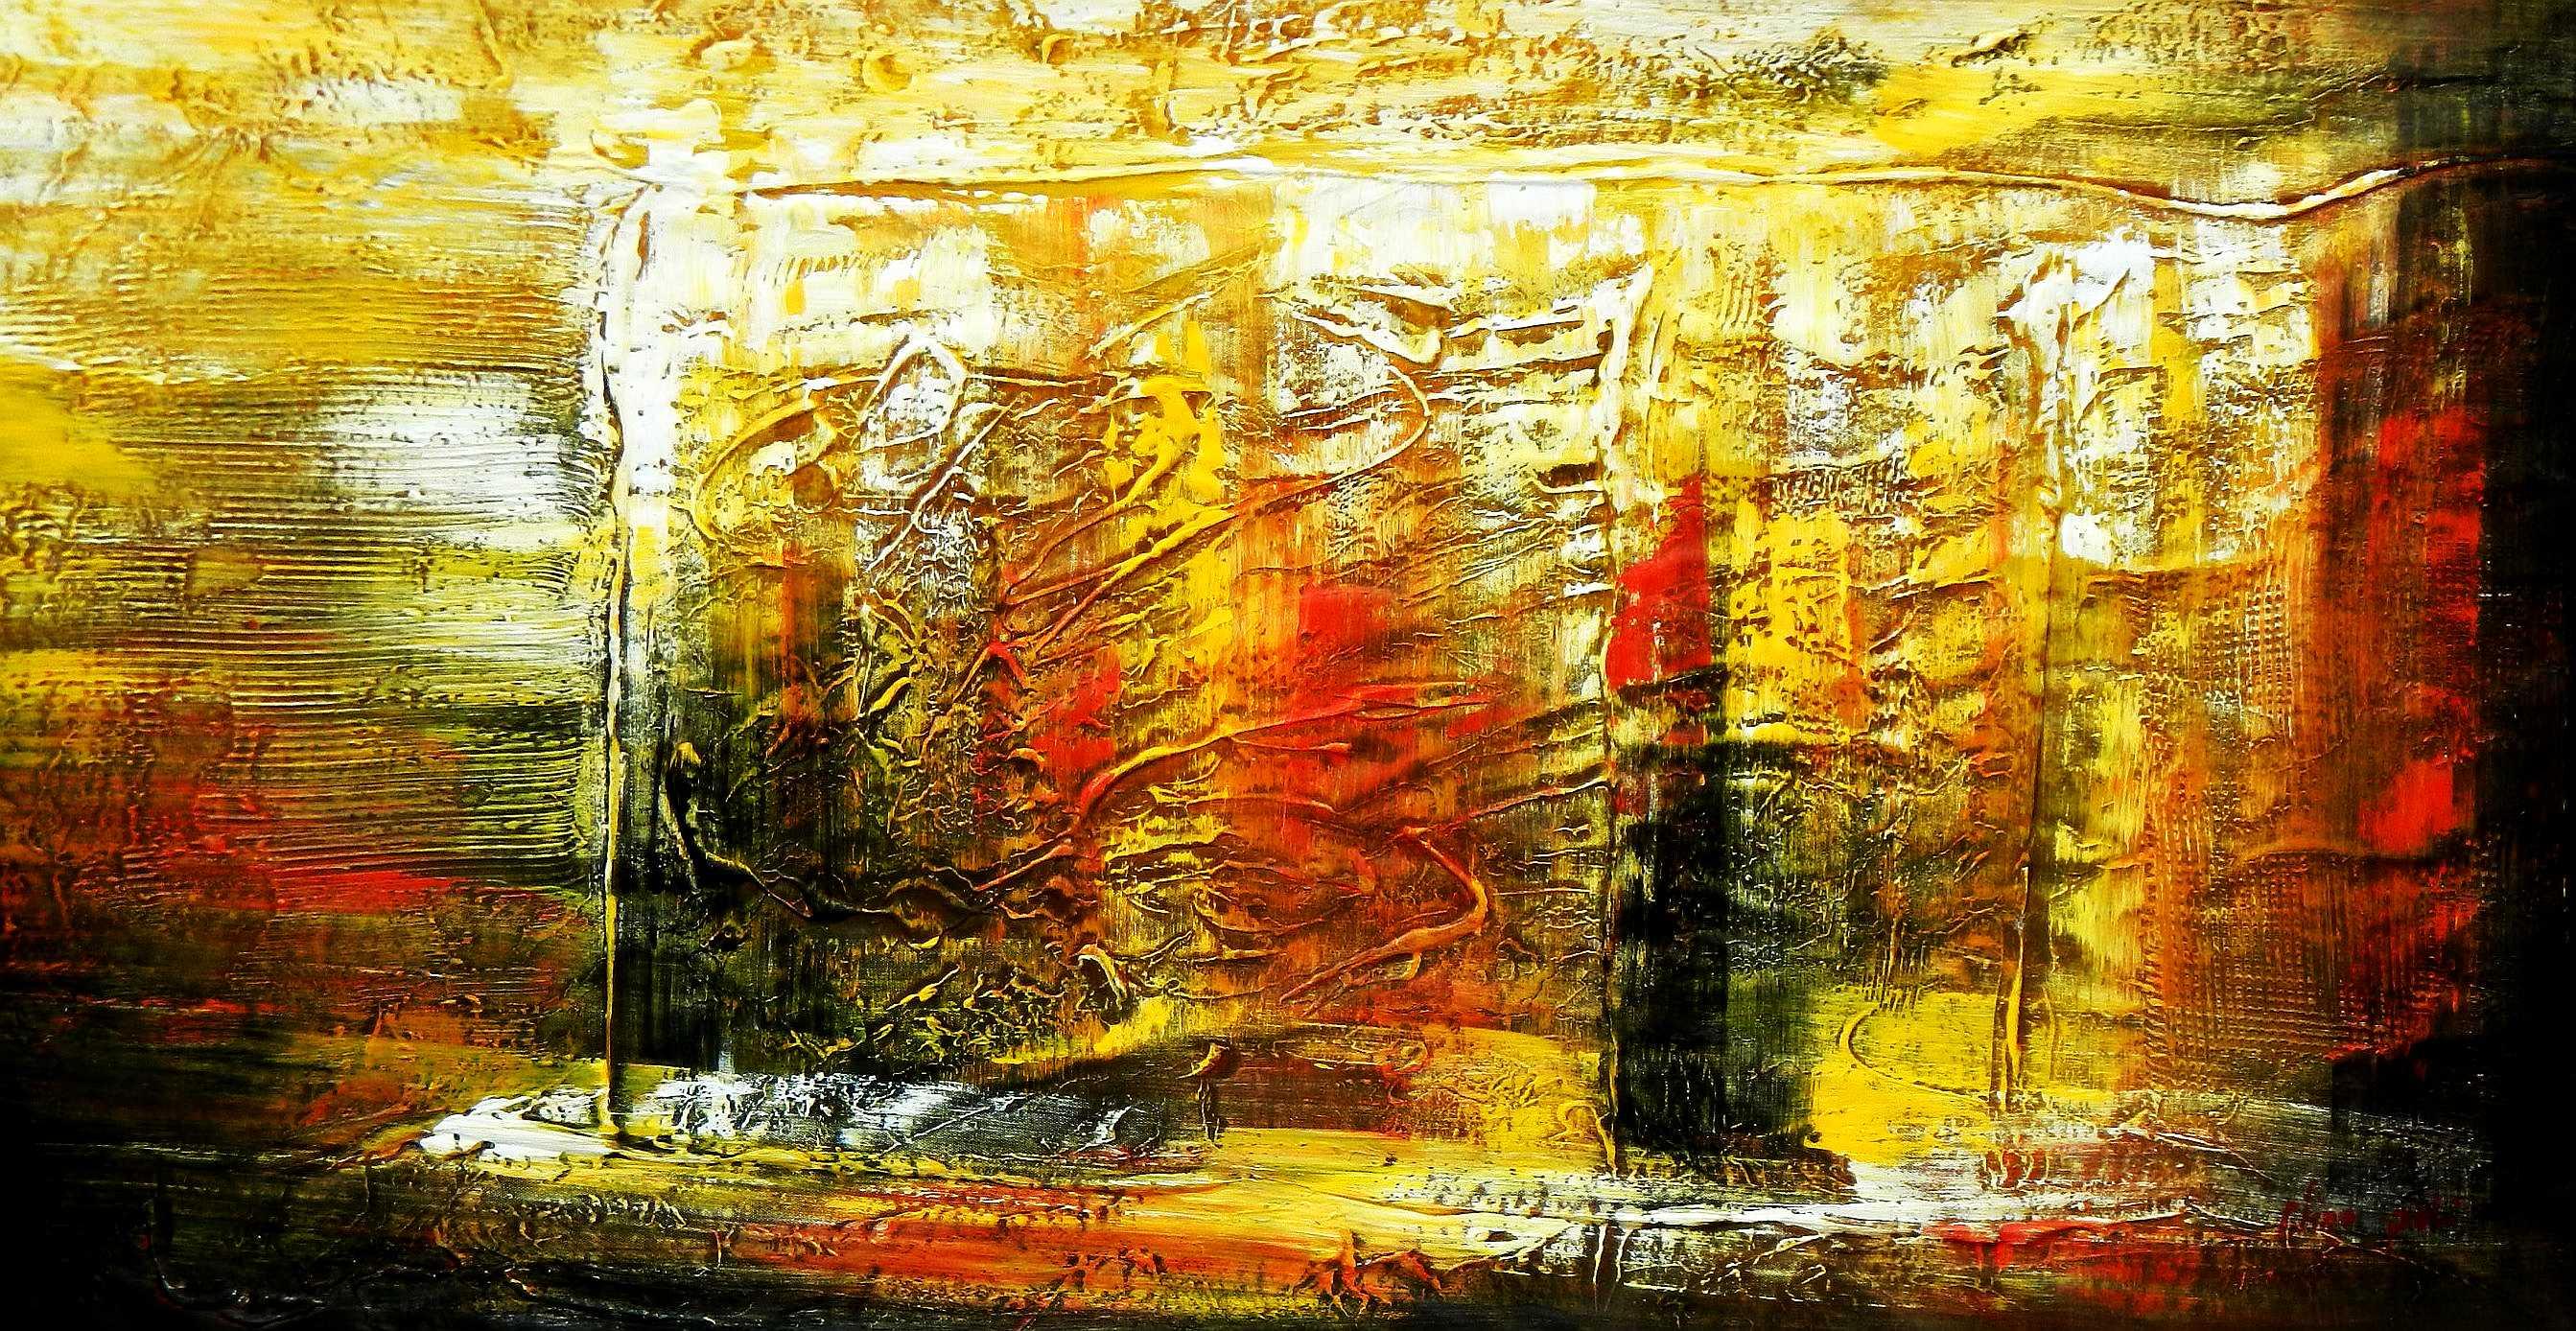 Abstrakt - Berlin am Lustgarten f94934 60x120cm Ölbild handgemalt